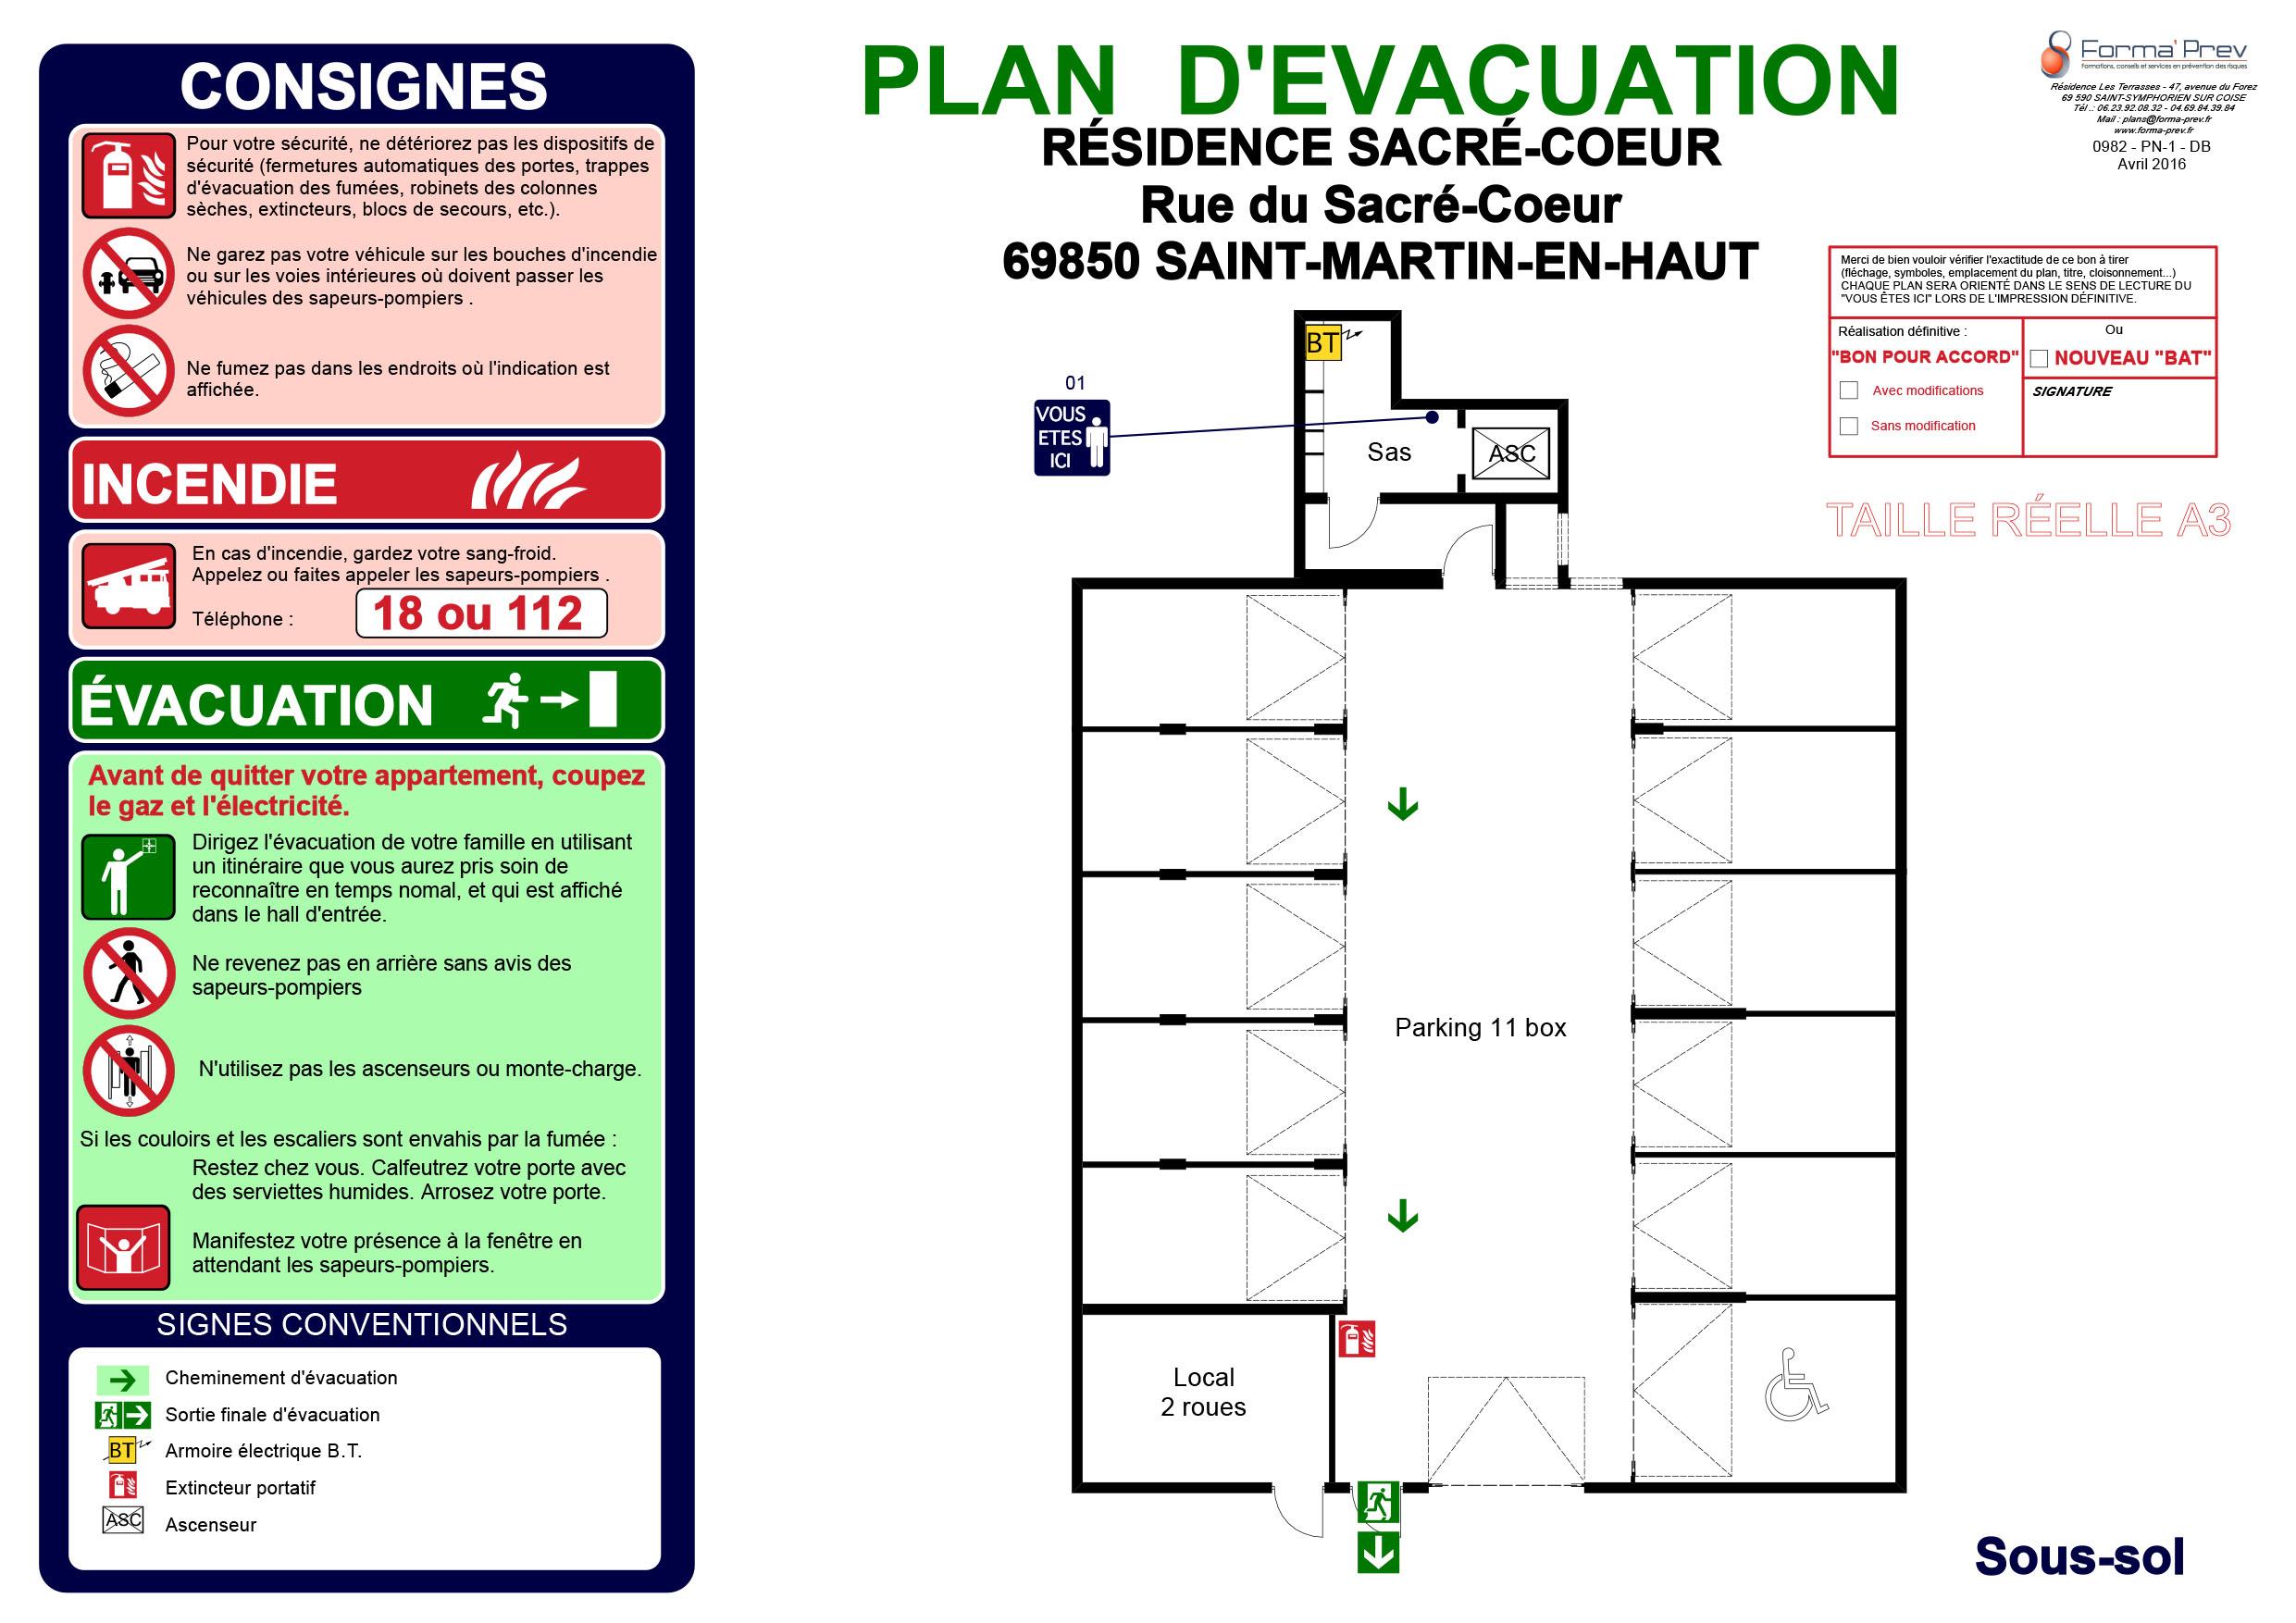 Plan d'évacuation 2